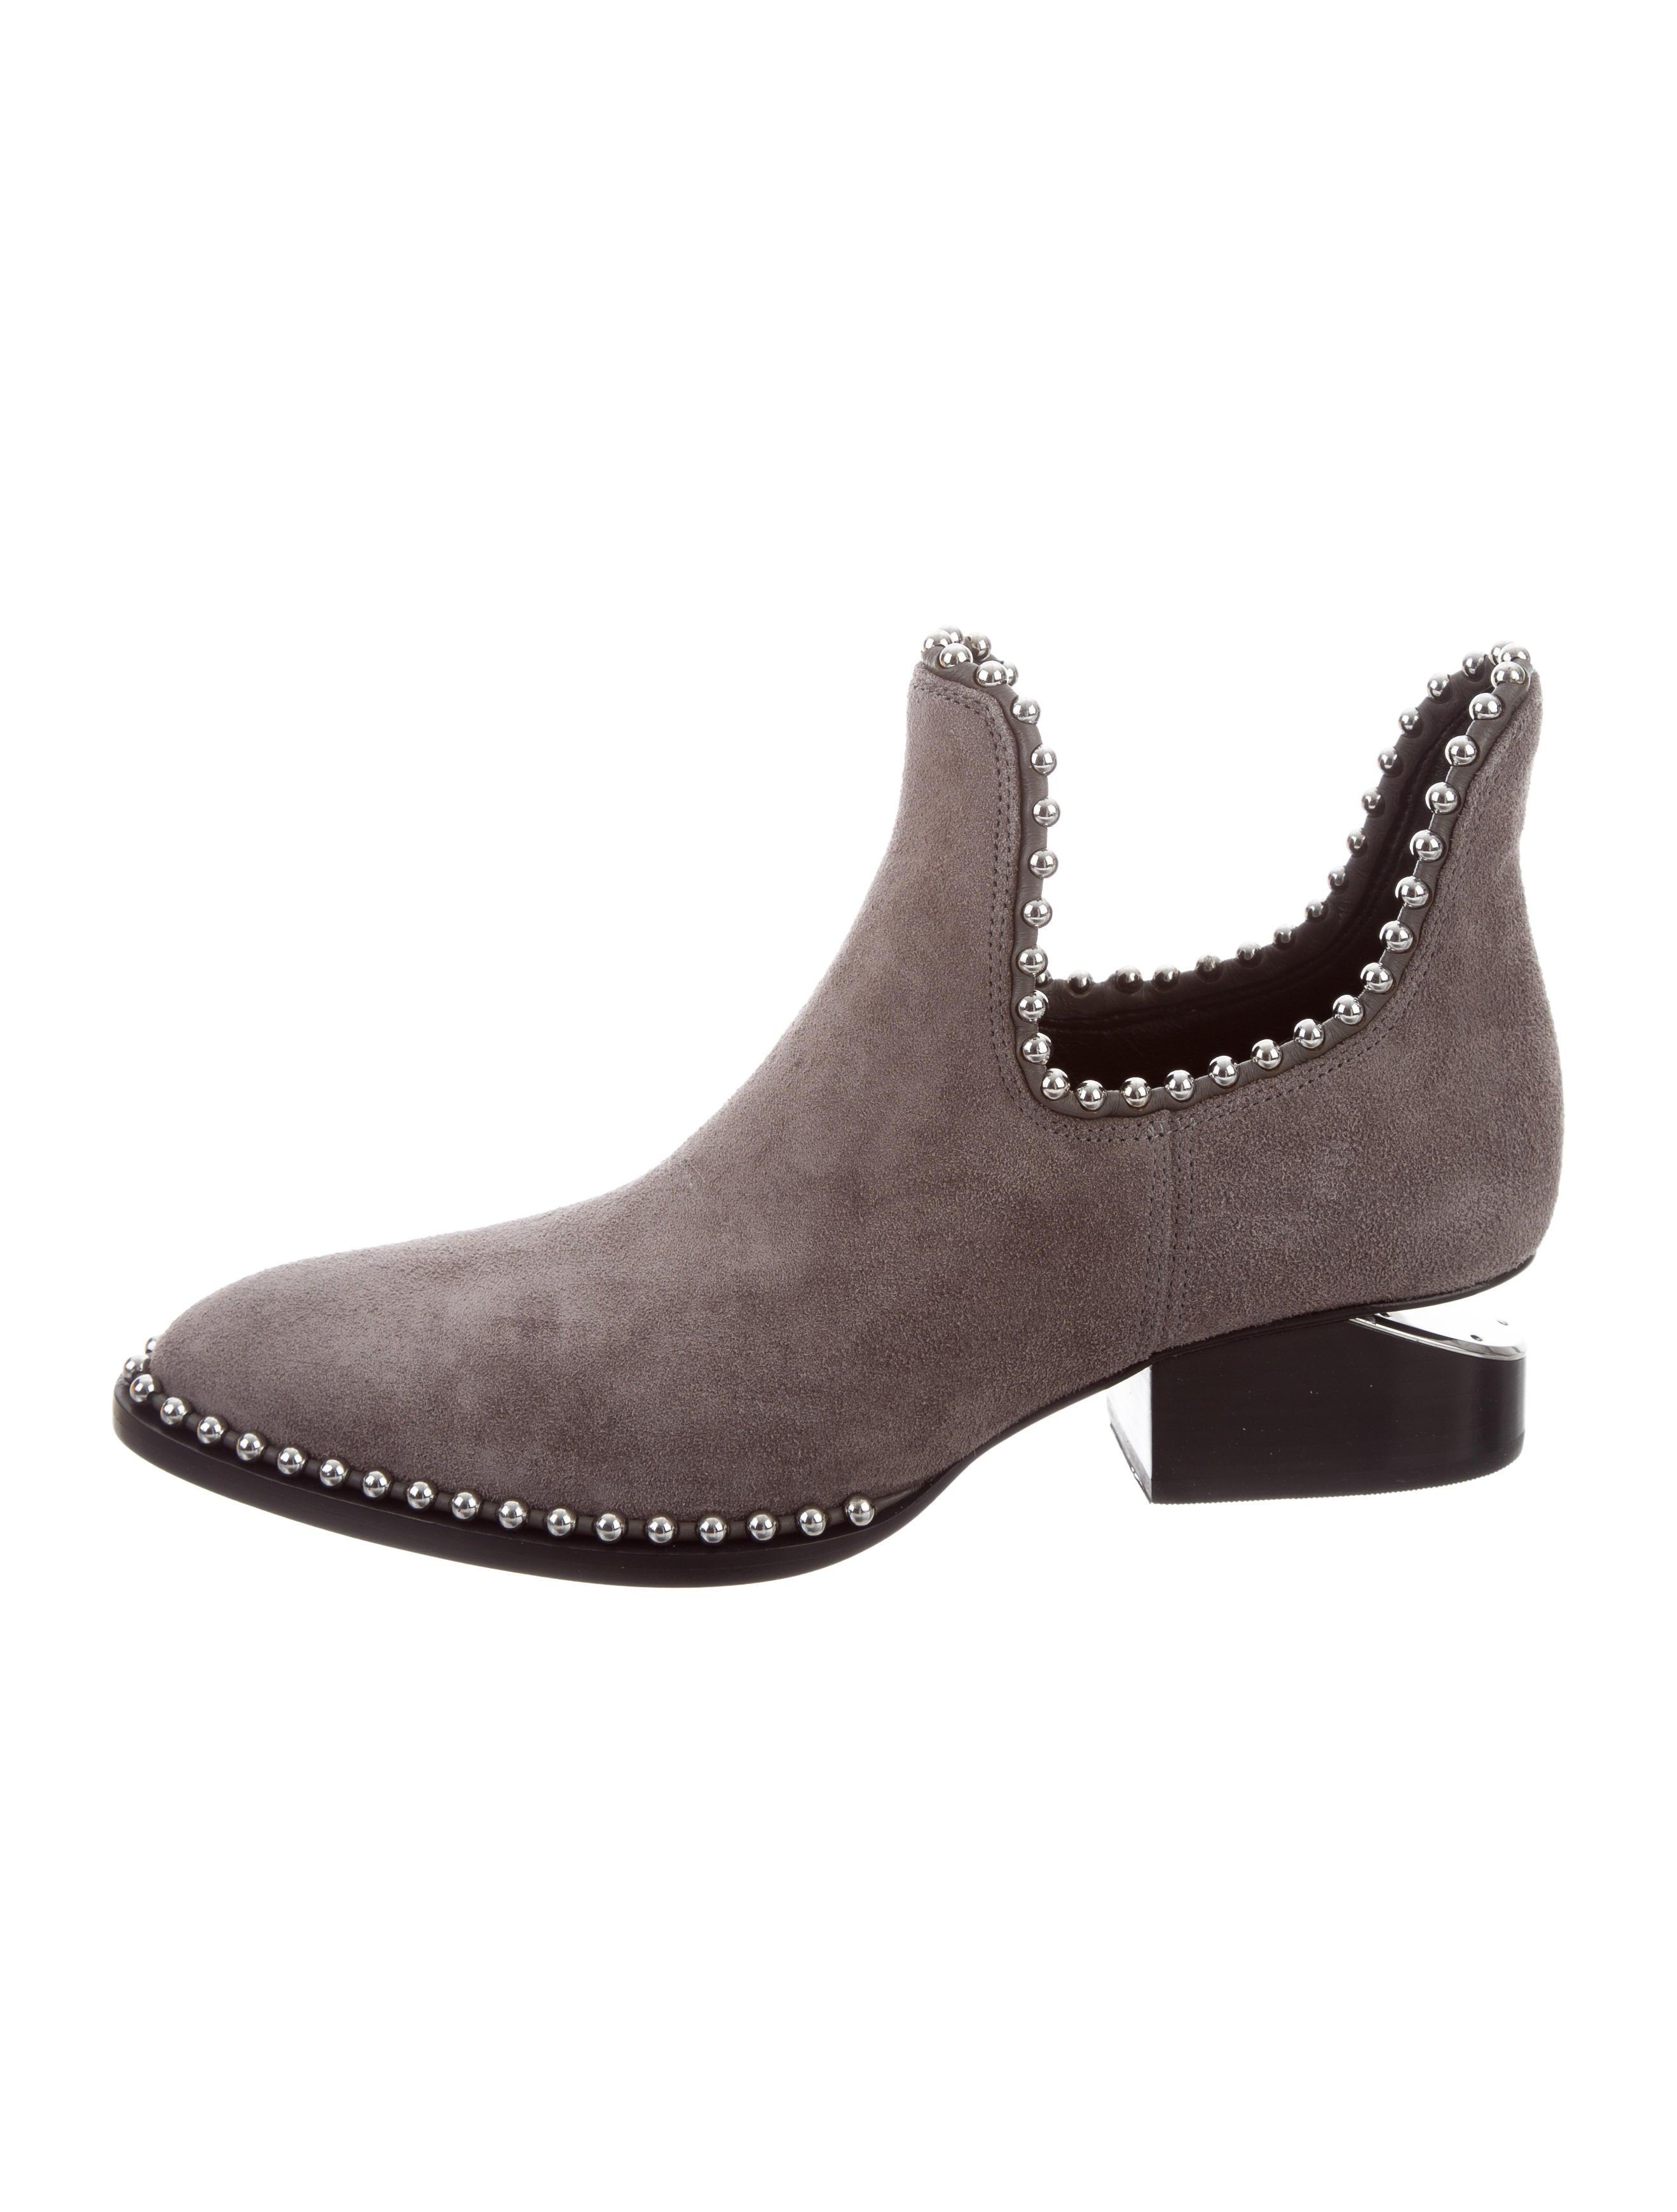 4cb22b758c2b Alexander Wang 2017 Kori Ankle Boots - Shoes - ALX39507